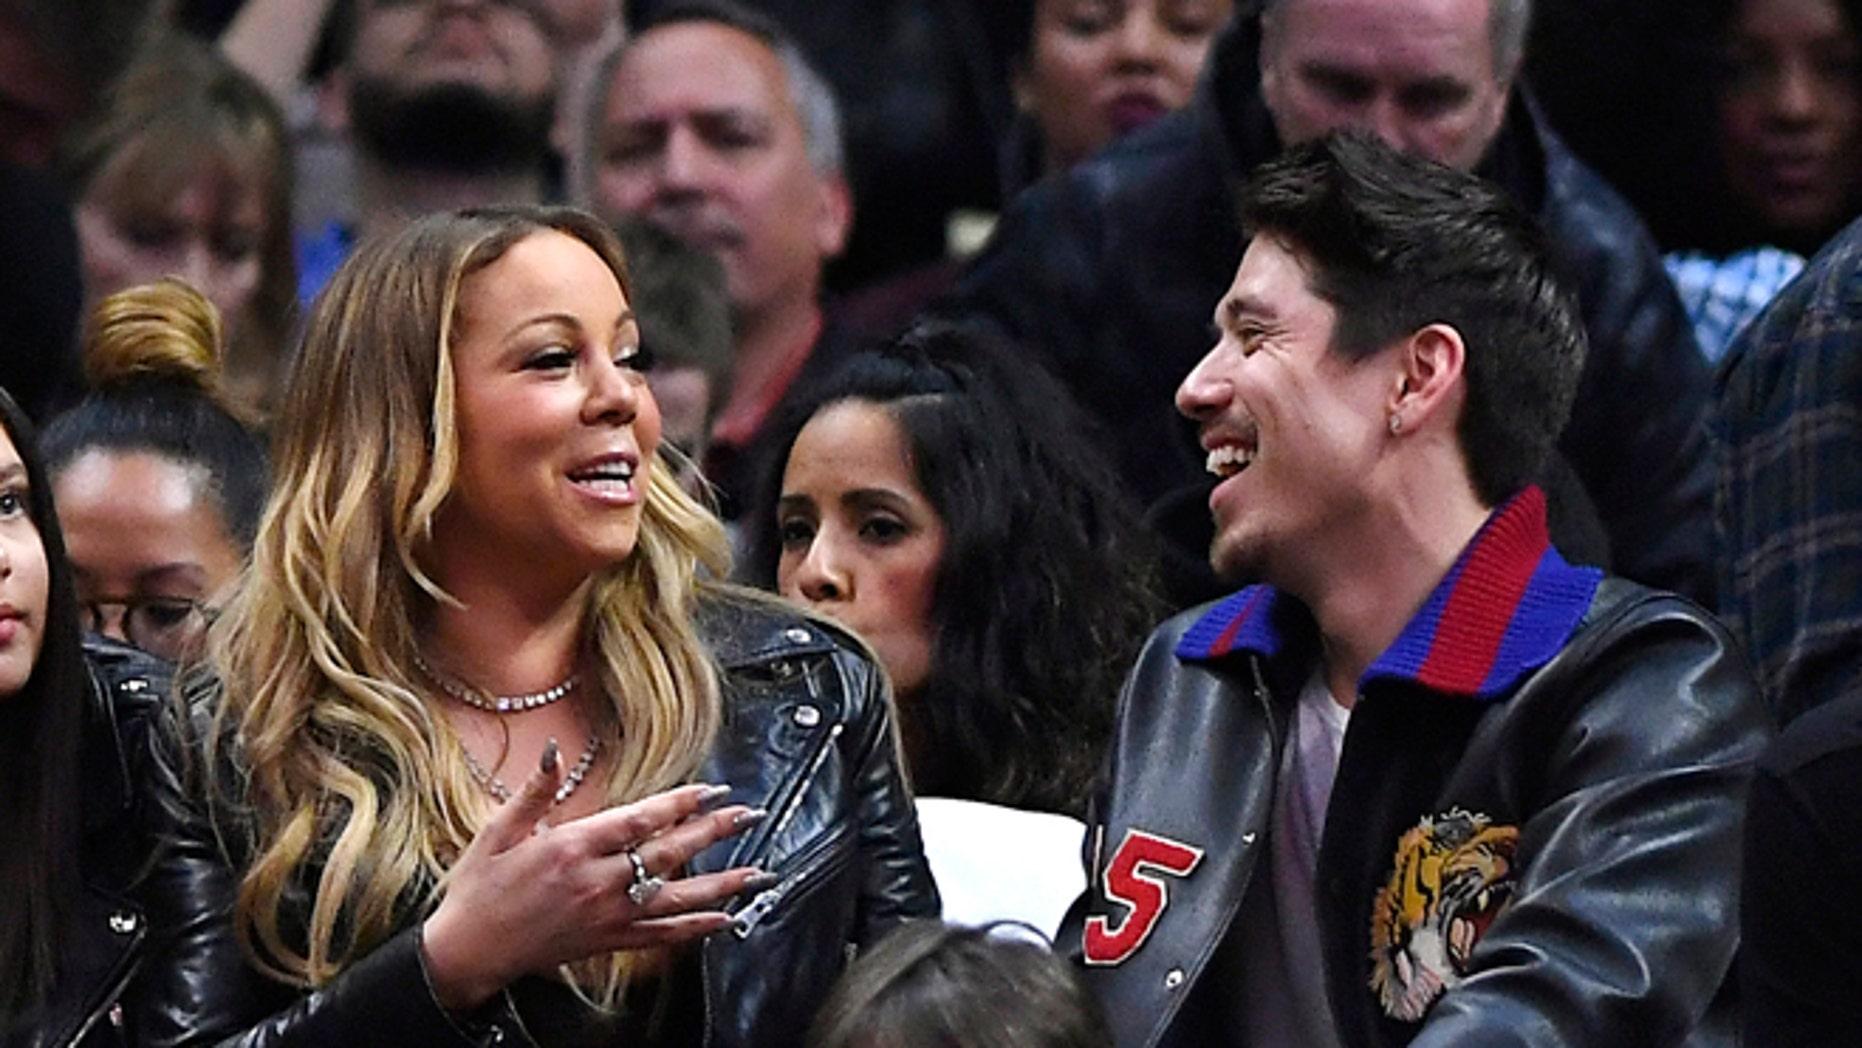 Mariah Carey confirmed she's dating backup dancer Bryan Tanaka.